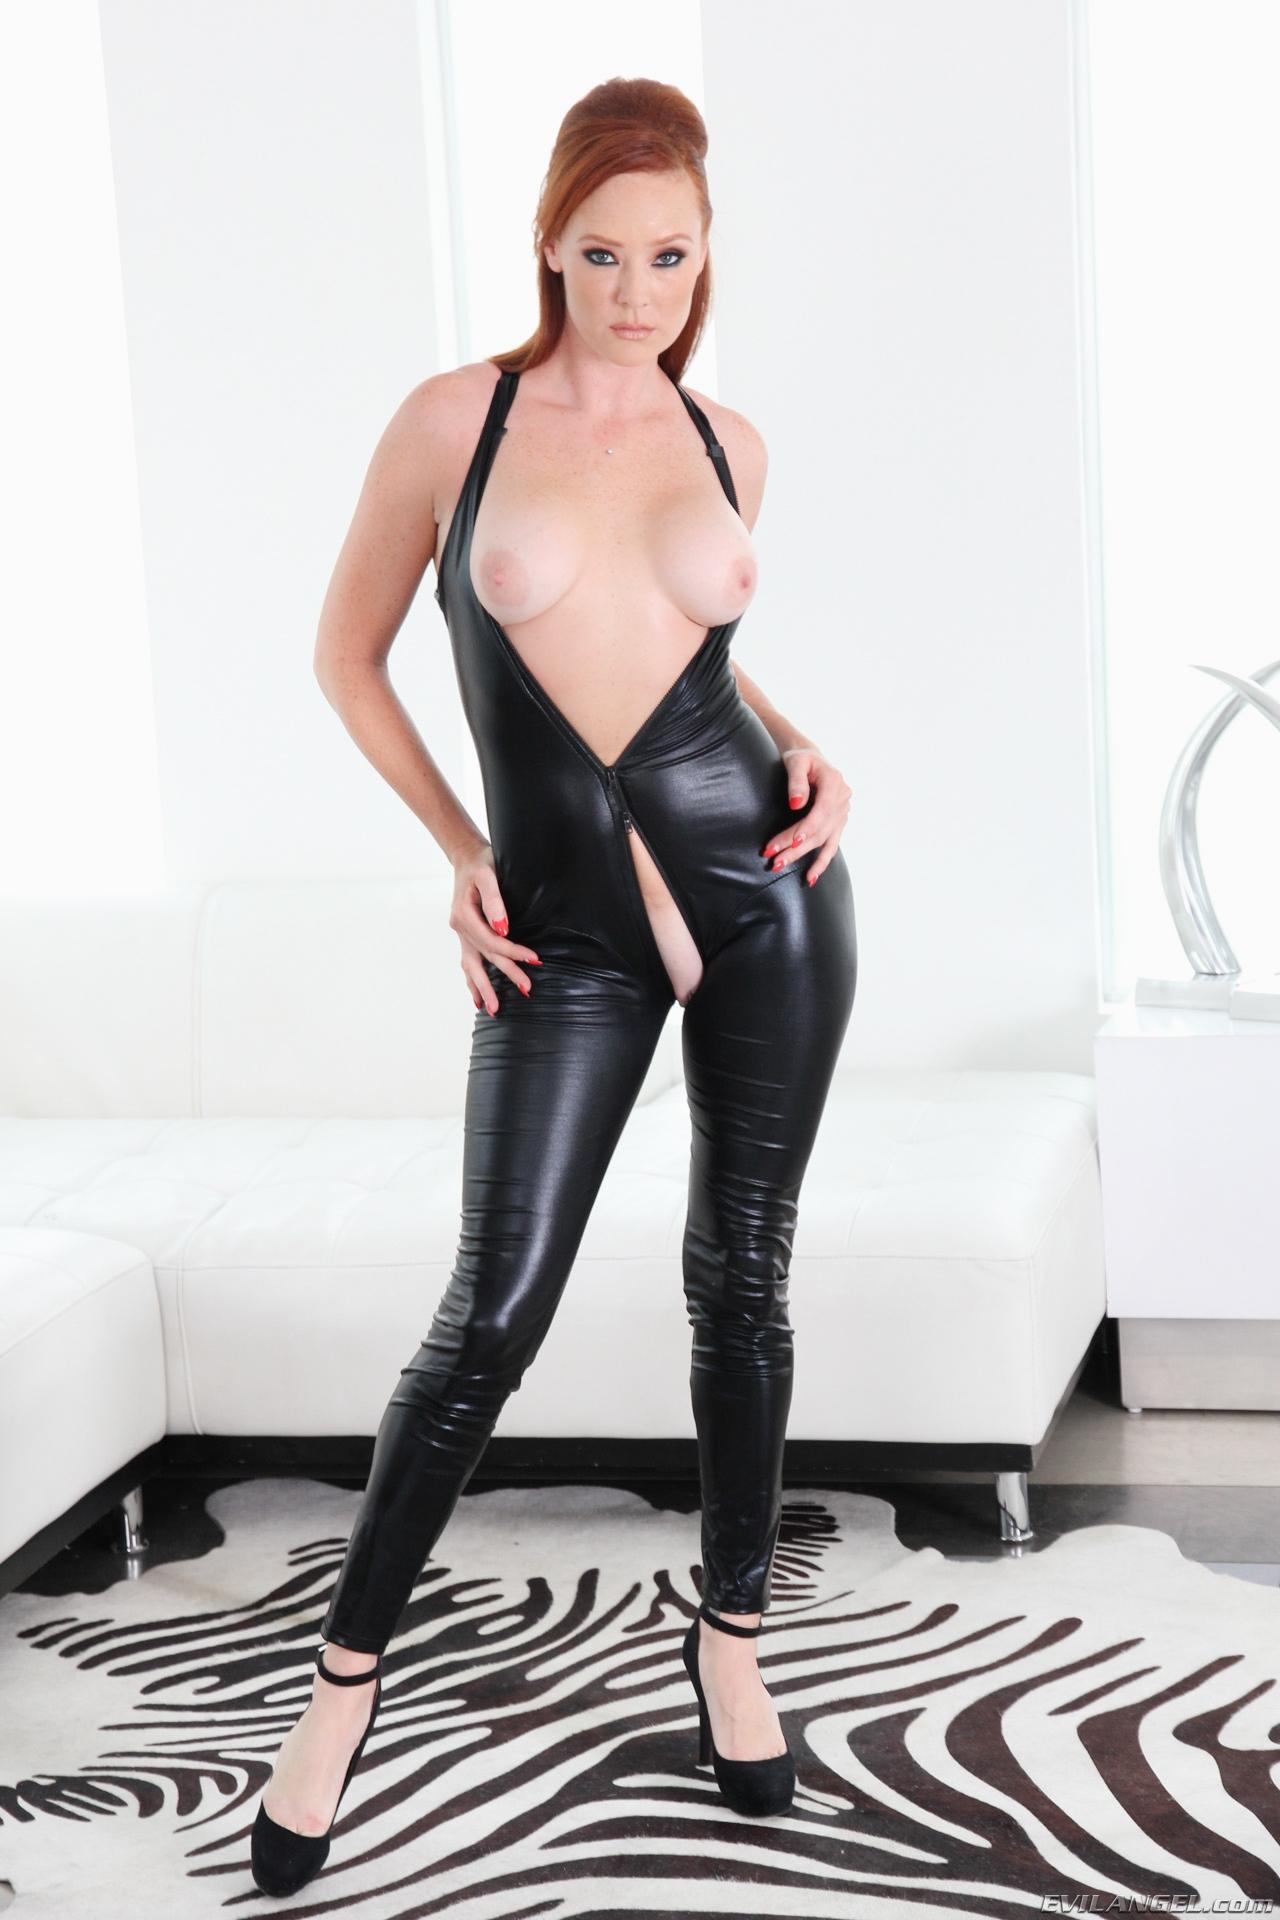 Mya looking girl porno bangbros